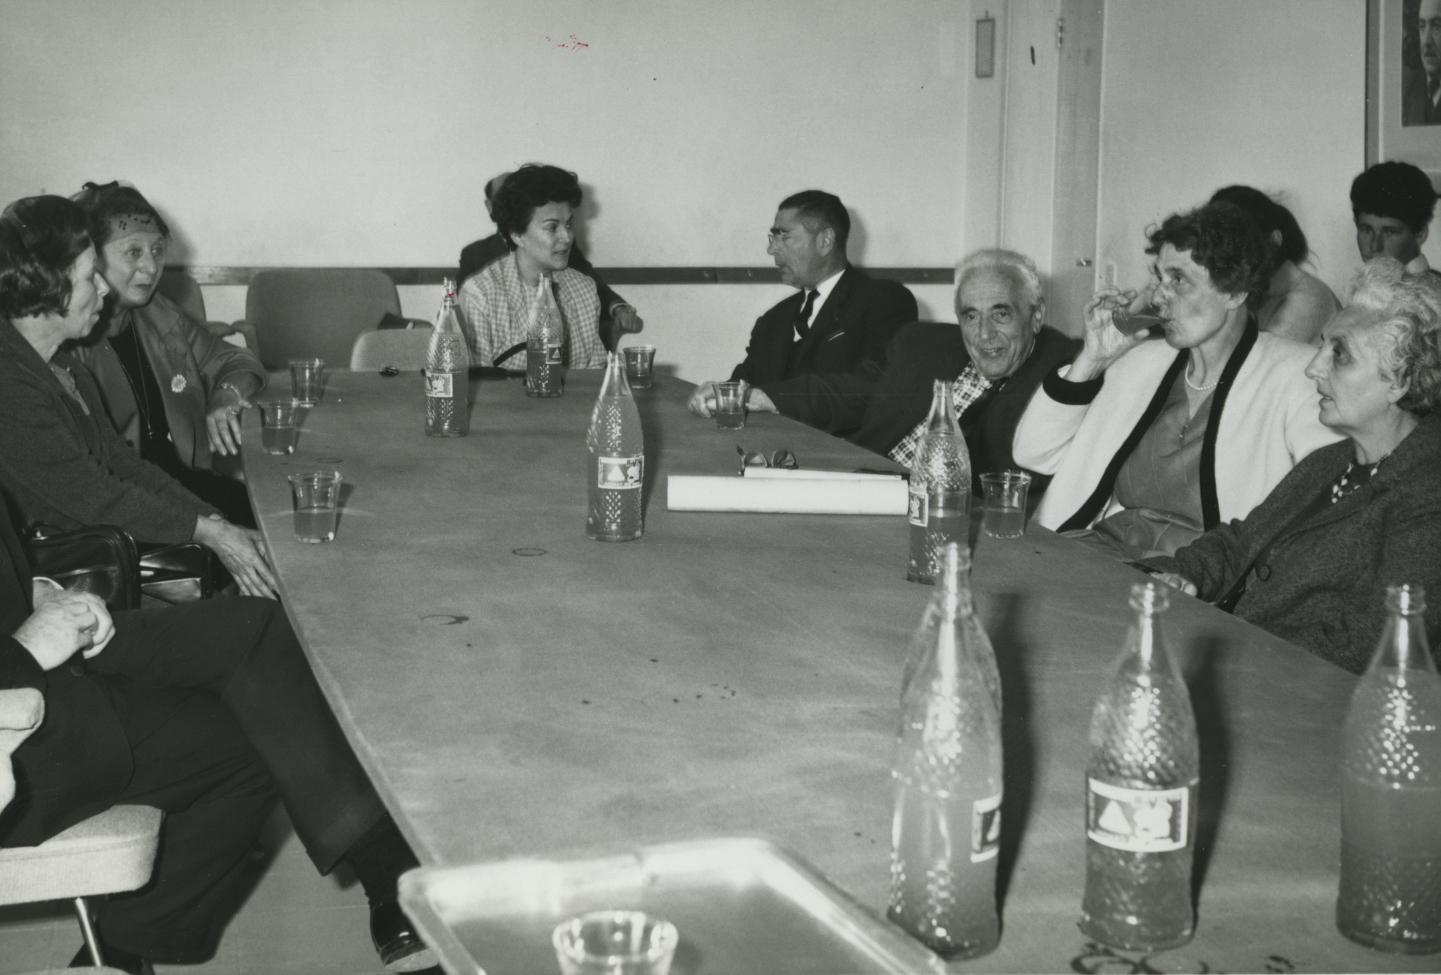 Ceremony in honor of Adelaide Hautval. Yad Vashem, 17.04.1966